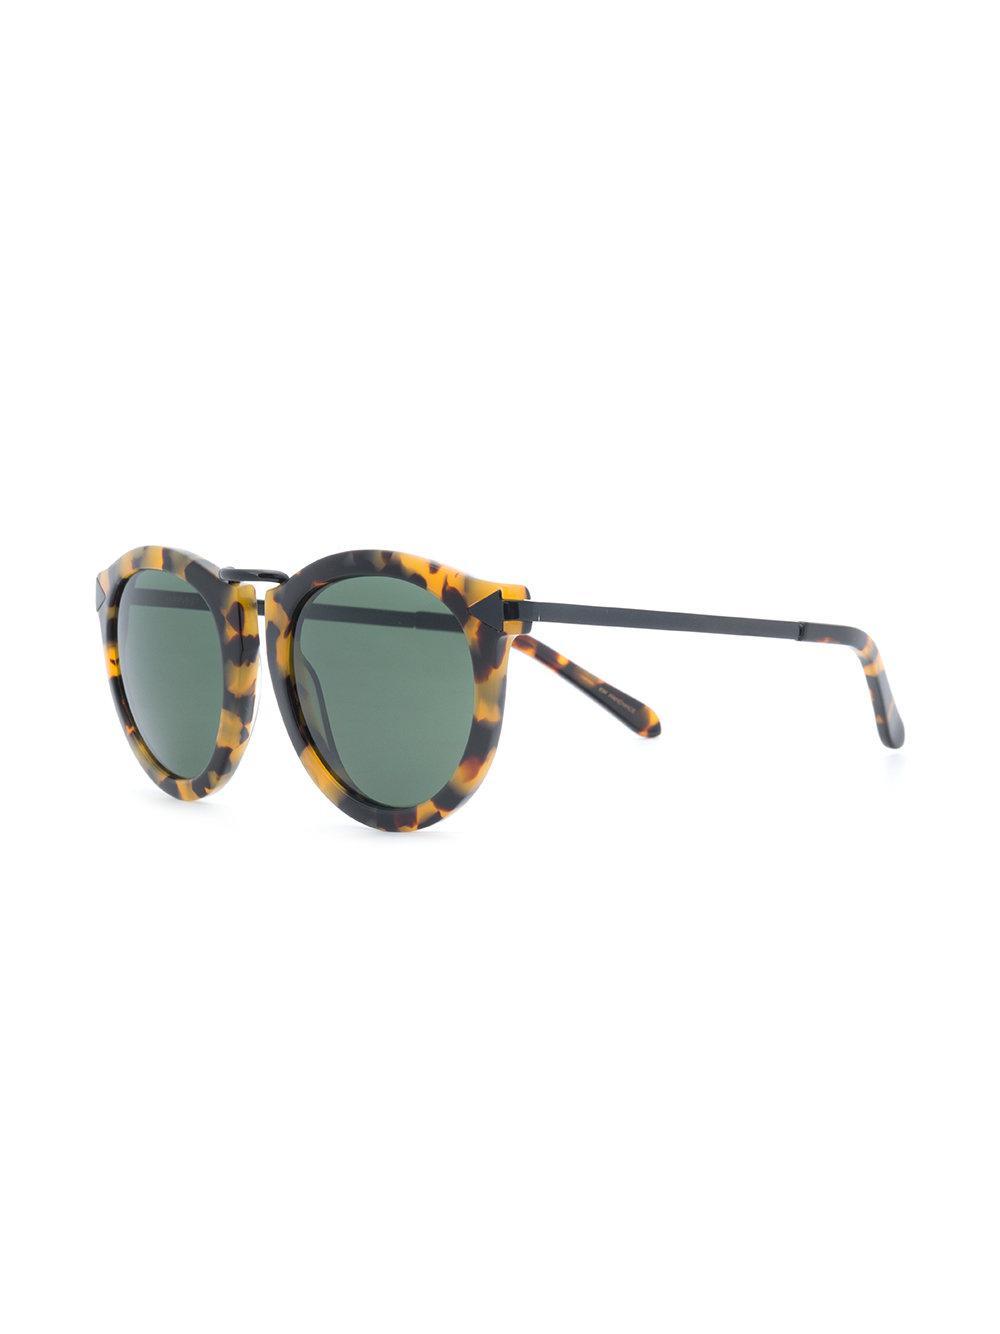 479f73dd8a Karen Walker - Multicolor Tortoiseshell Round Sunglasses - Lyst. View  Fullscreen